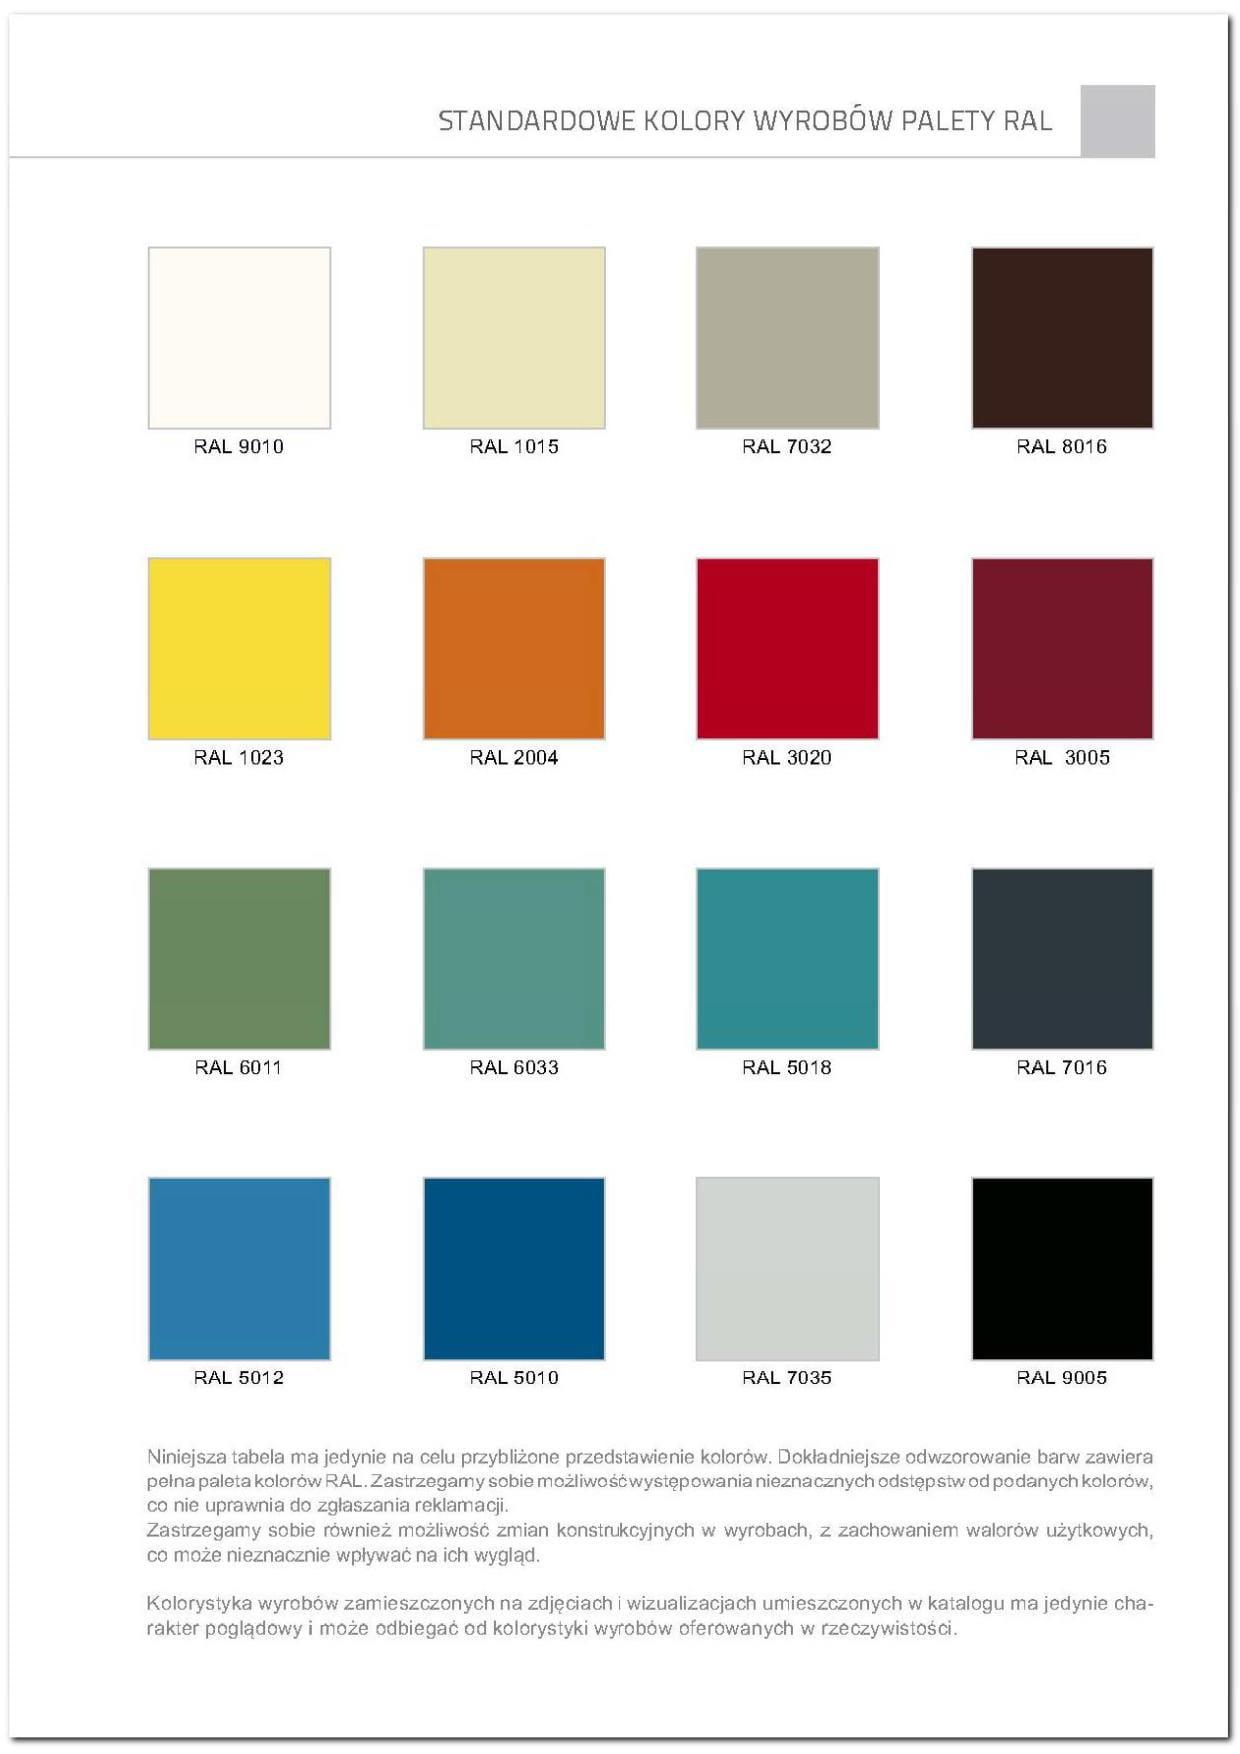 3bd984f33b7f8 Szafa kartotekowa SZK 318 na format B5 pozostałe kolory - szafy ...